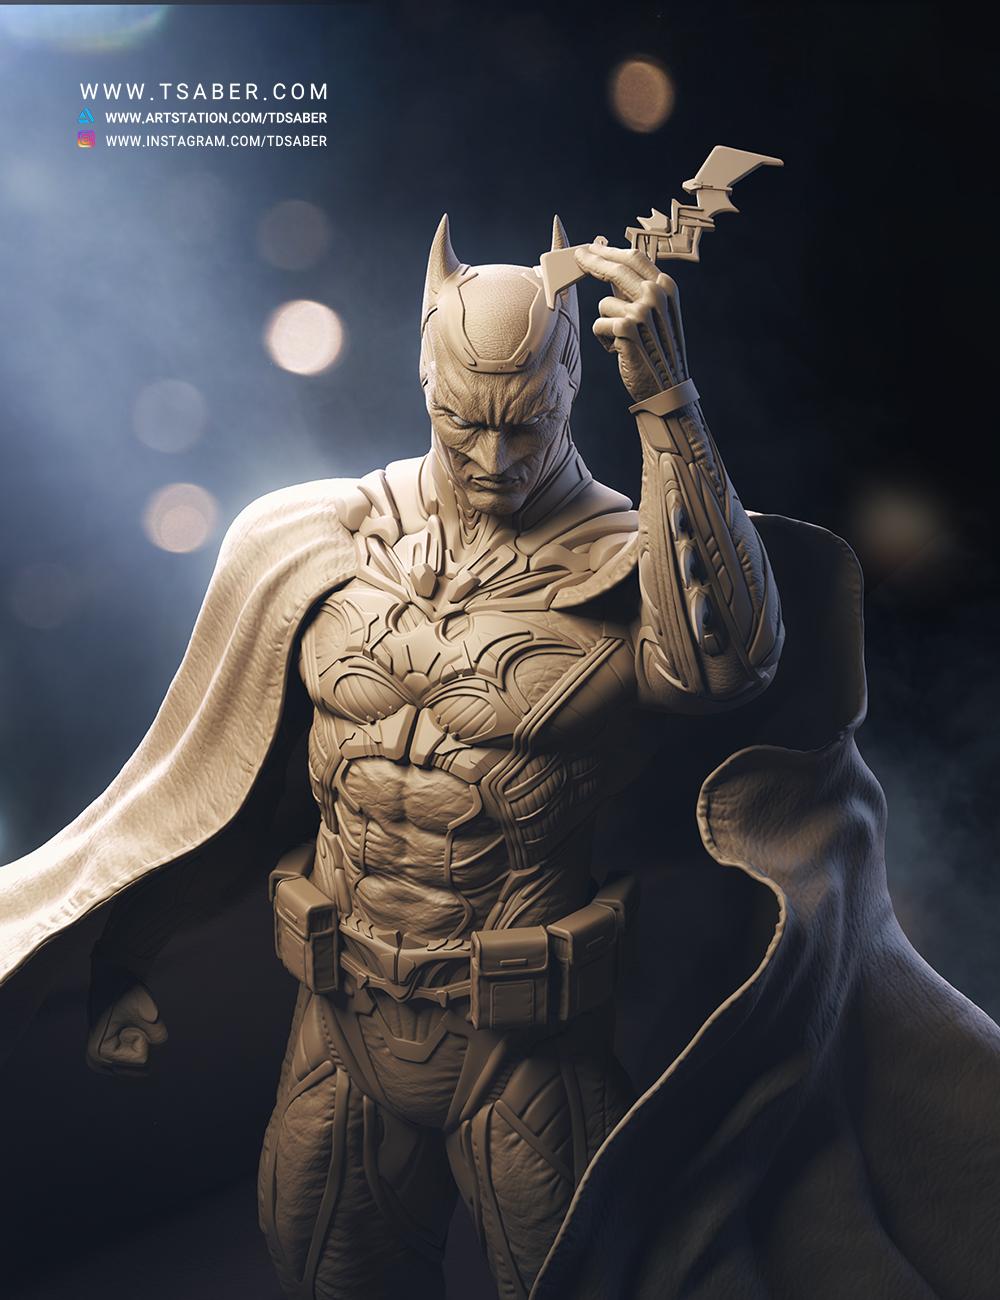 Batman Statue - Zbrush character sculpture - DC Comics Collectible - Tsaber